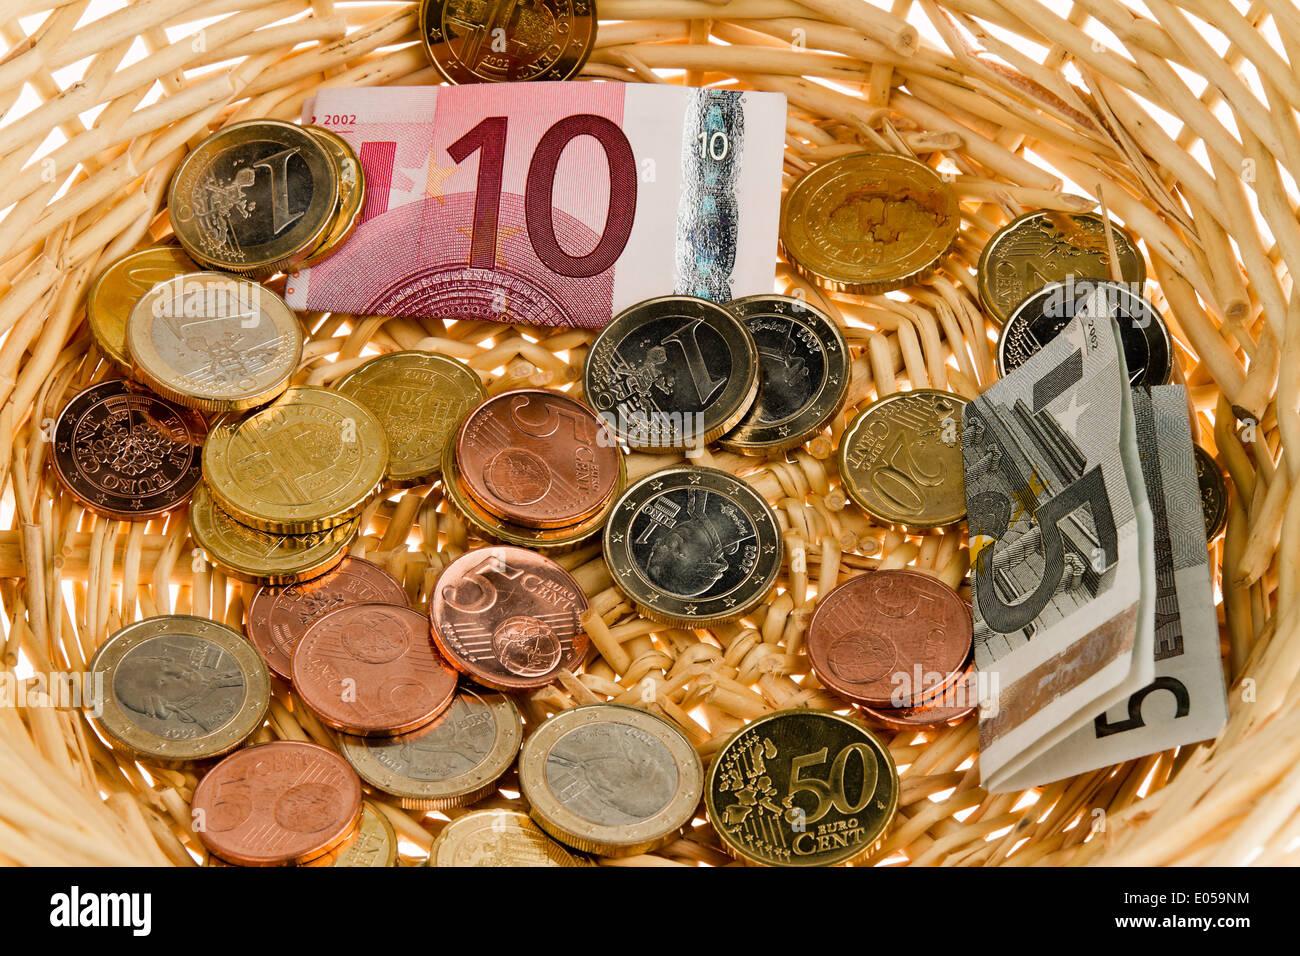 A donation basket for collection. Money donation with euro, Ein Spendenkorb fuer Sammlung. Geld Spende mit Euro - Stock Image